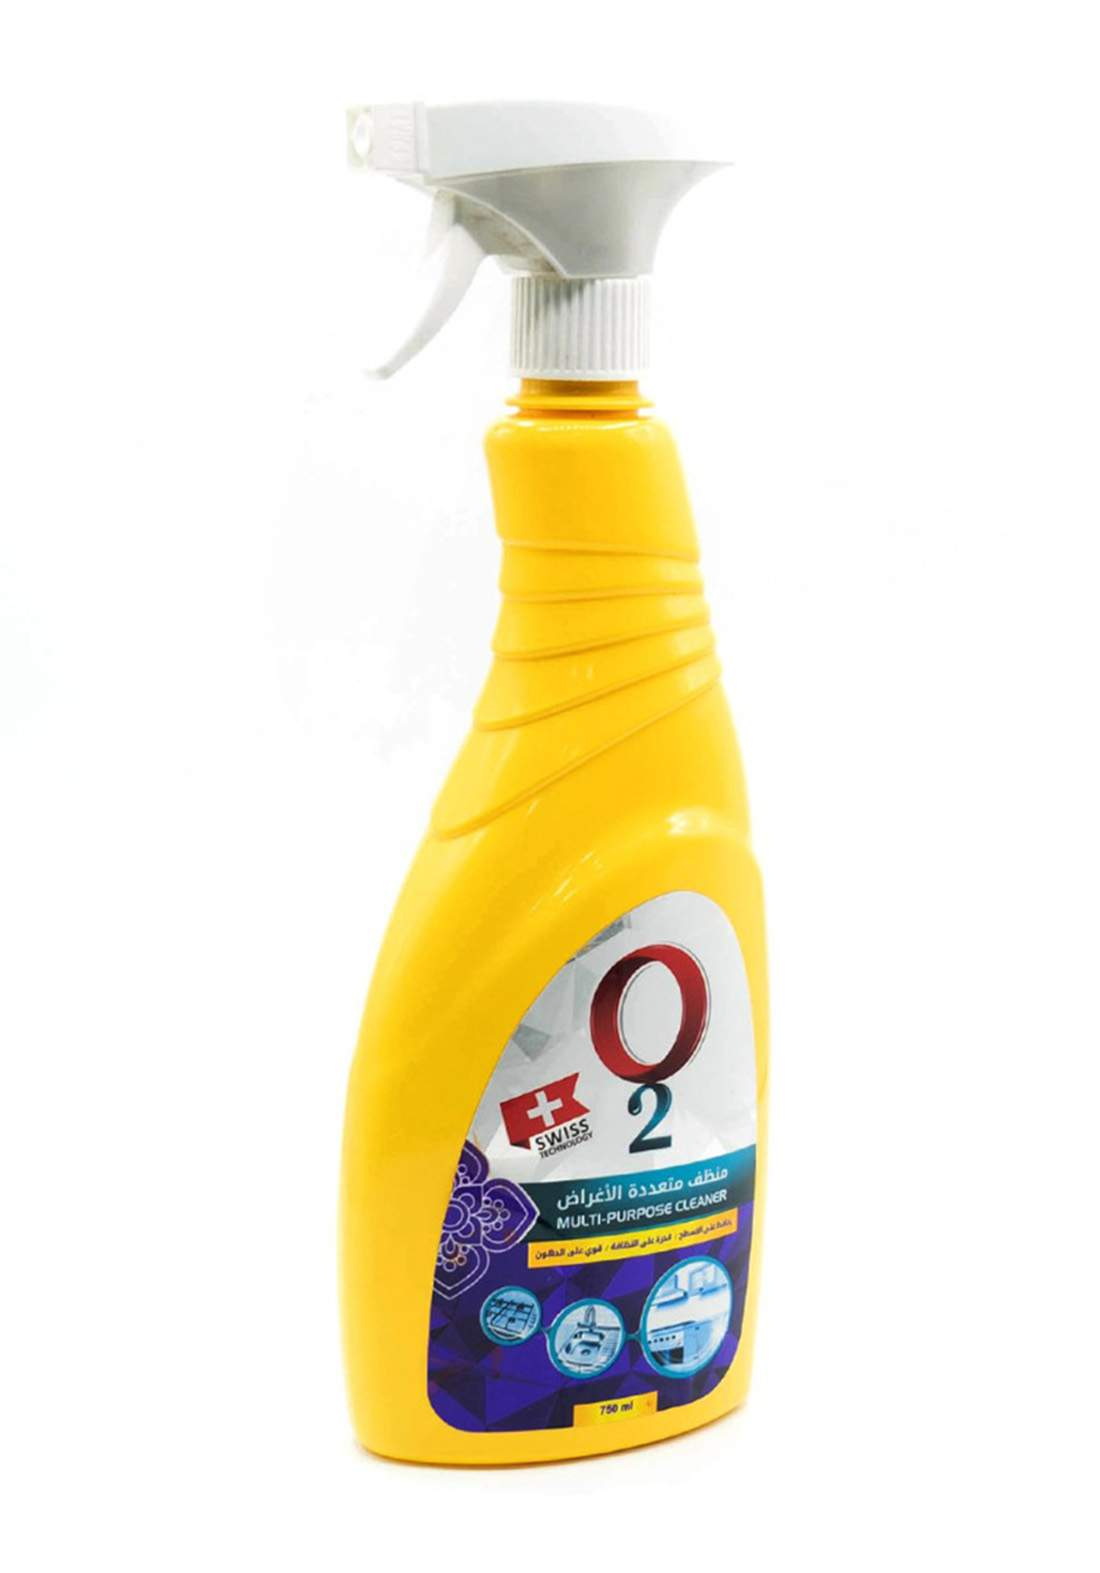 O2 Multipurpose cleaner او تو منظف متعدد الاستعمالات